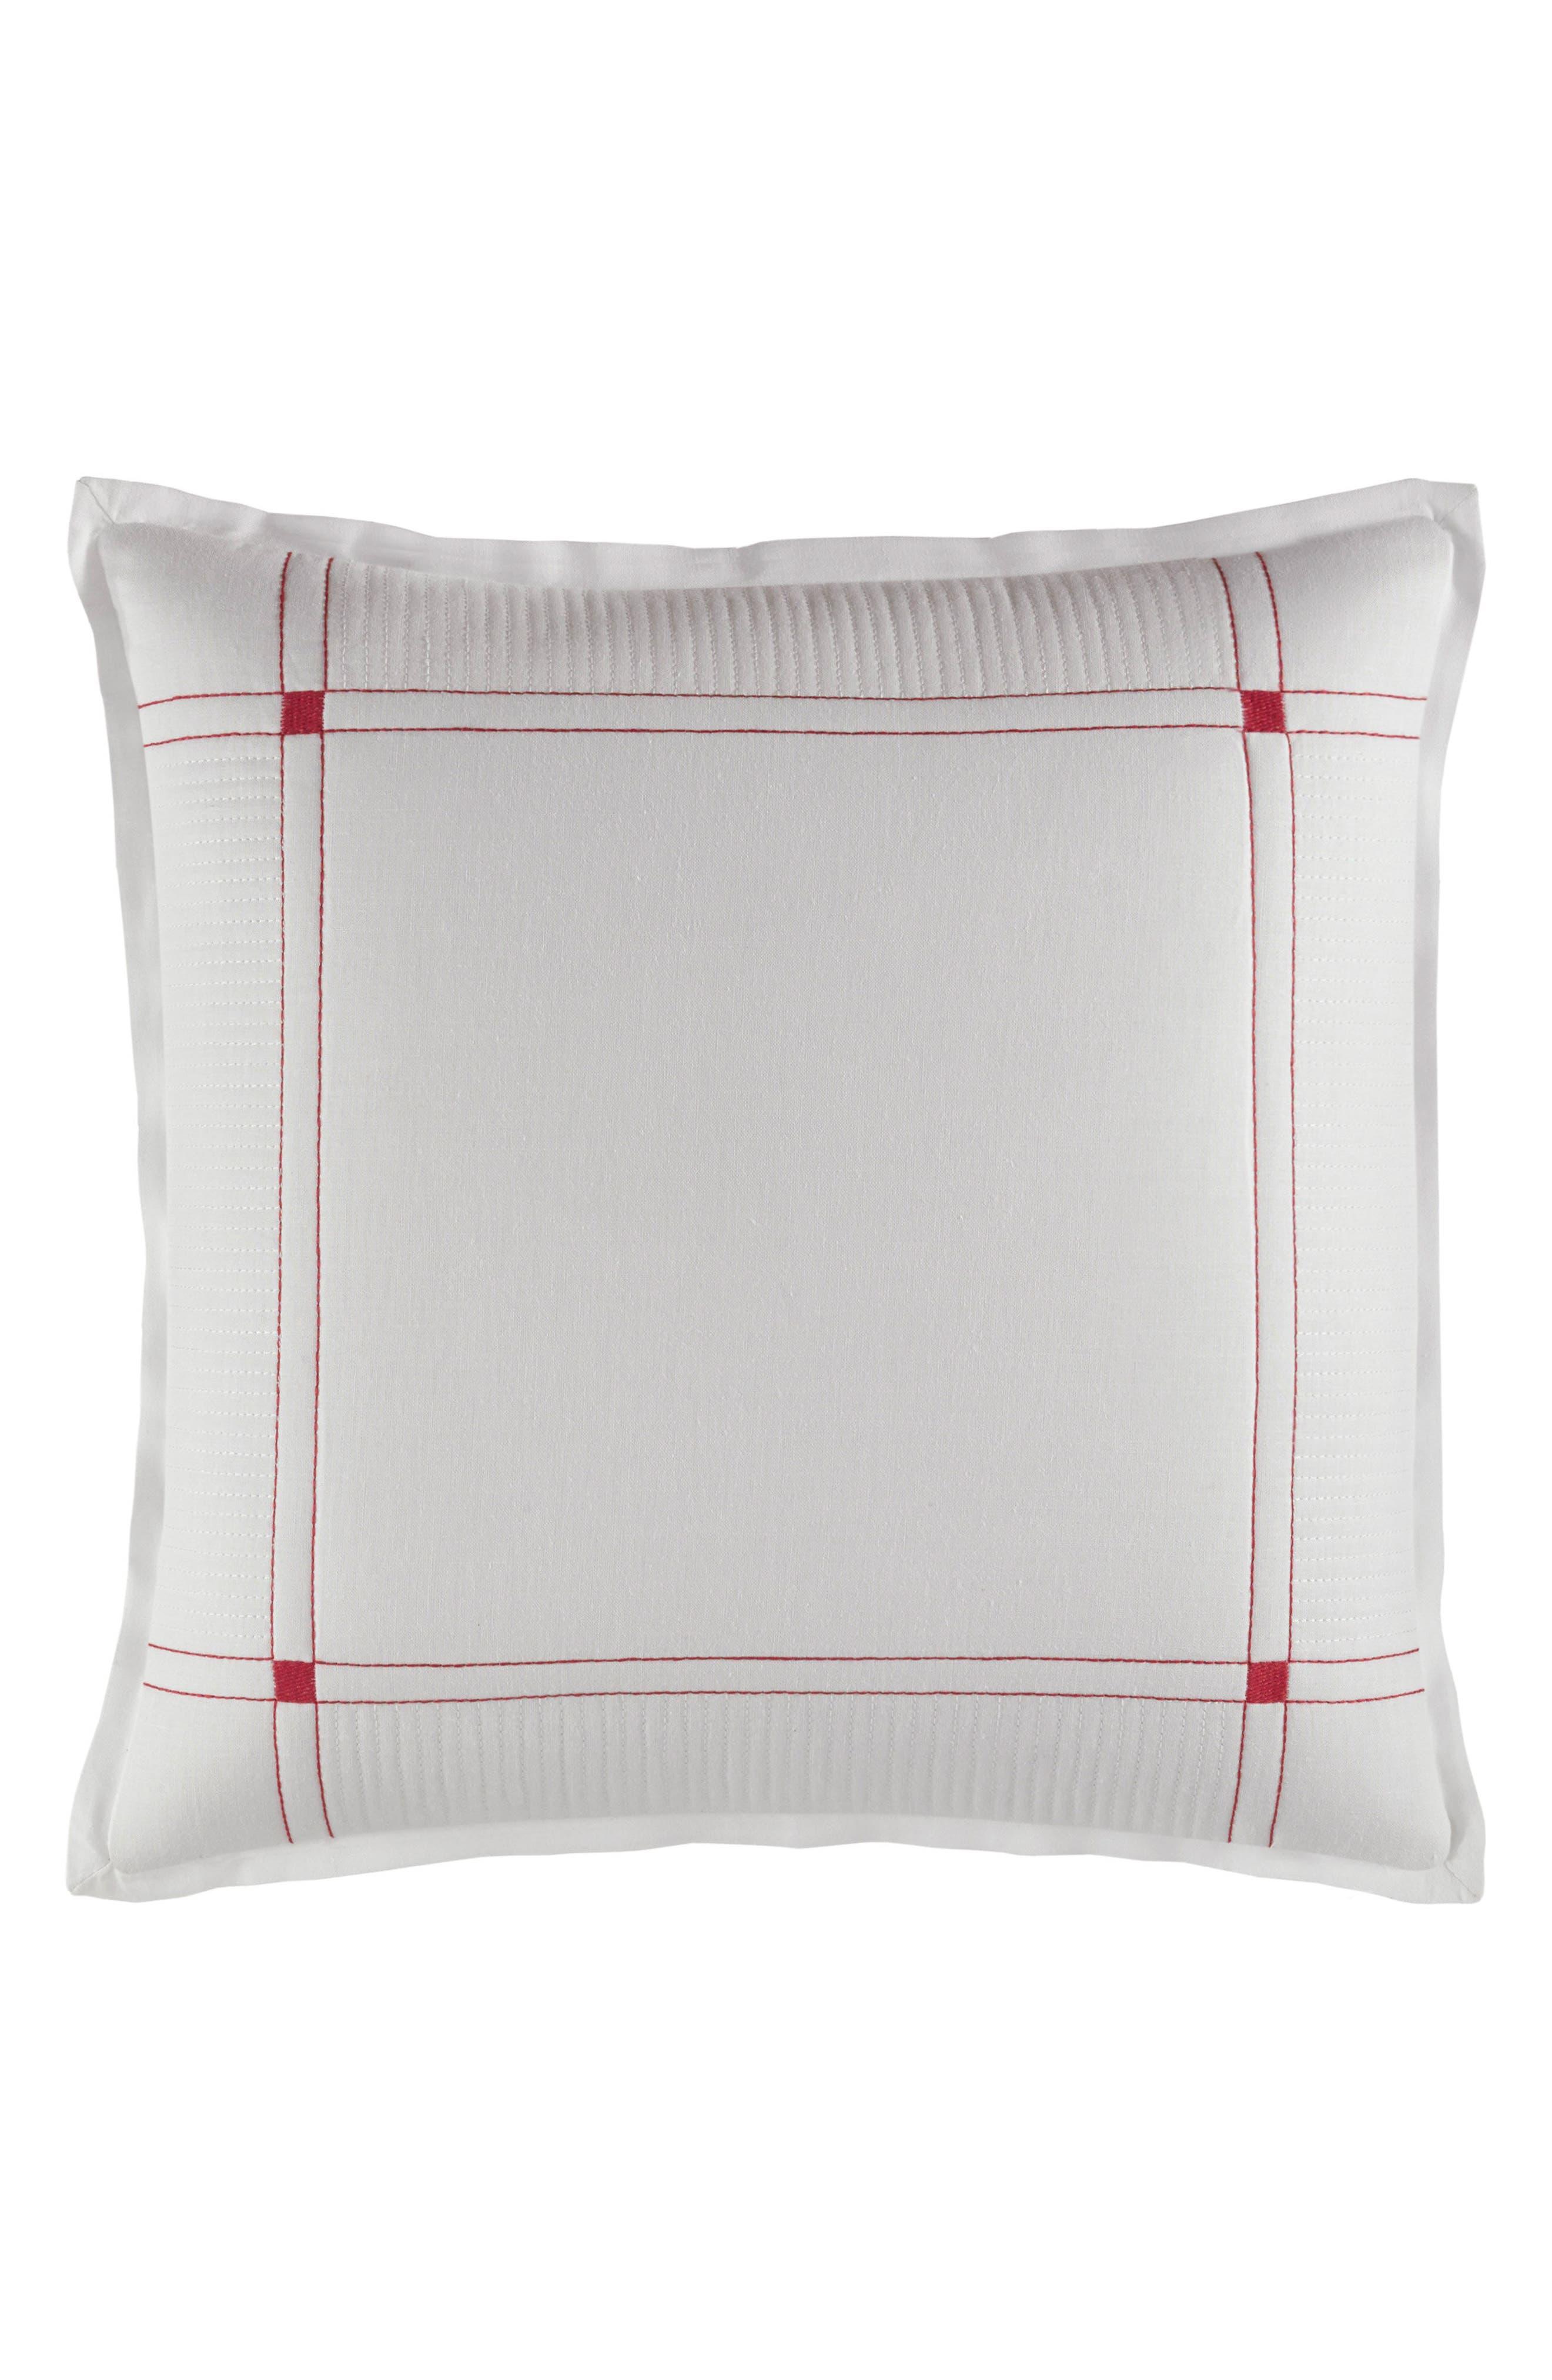 Trawler Pillow,                         Main,                         color, 100